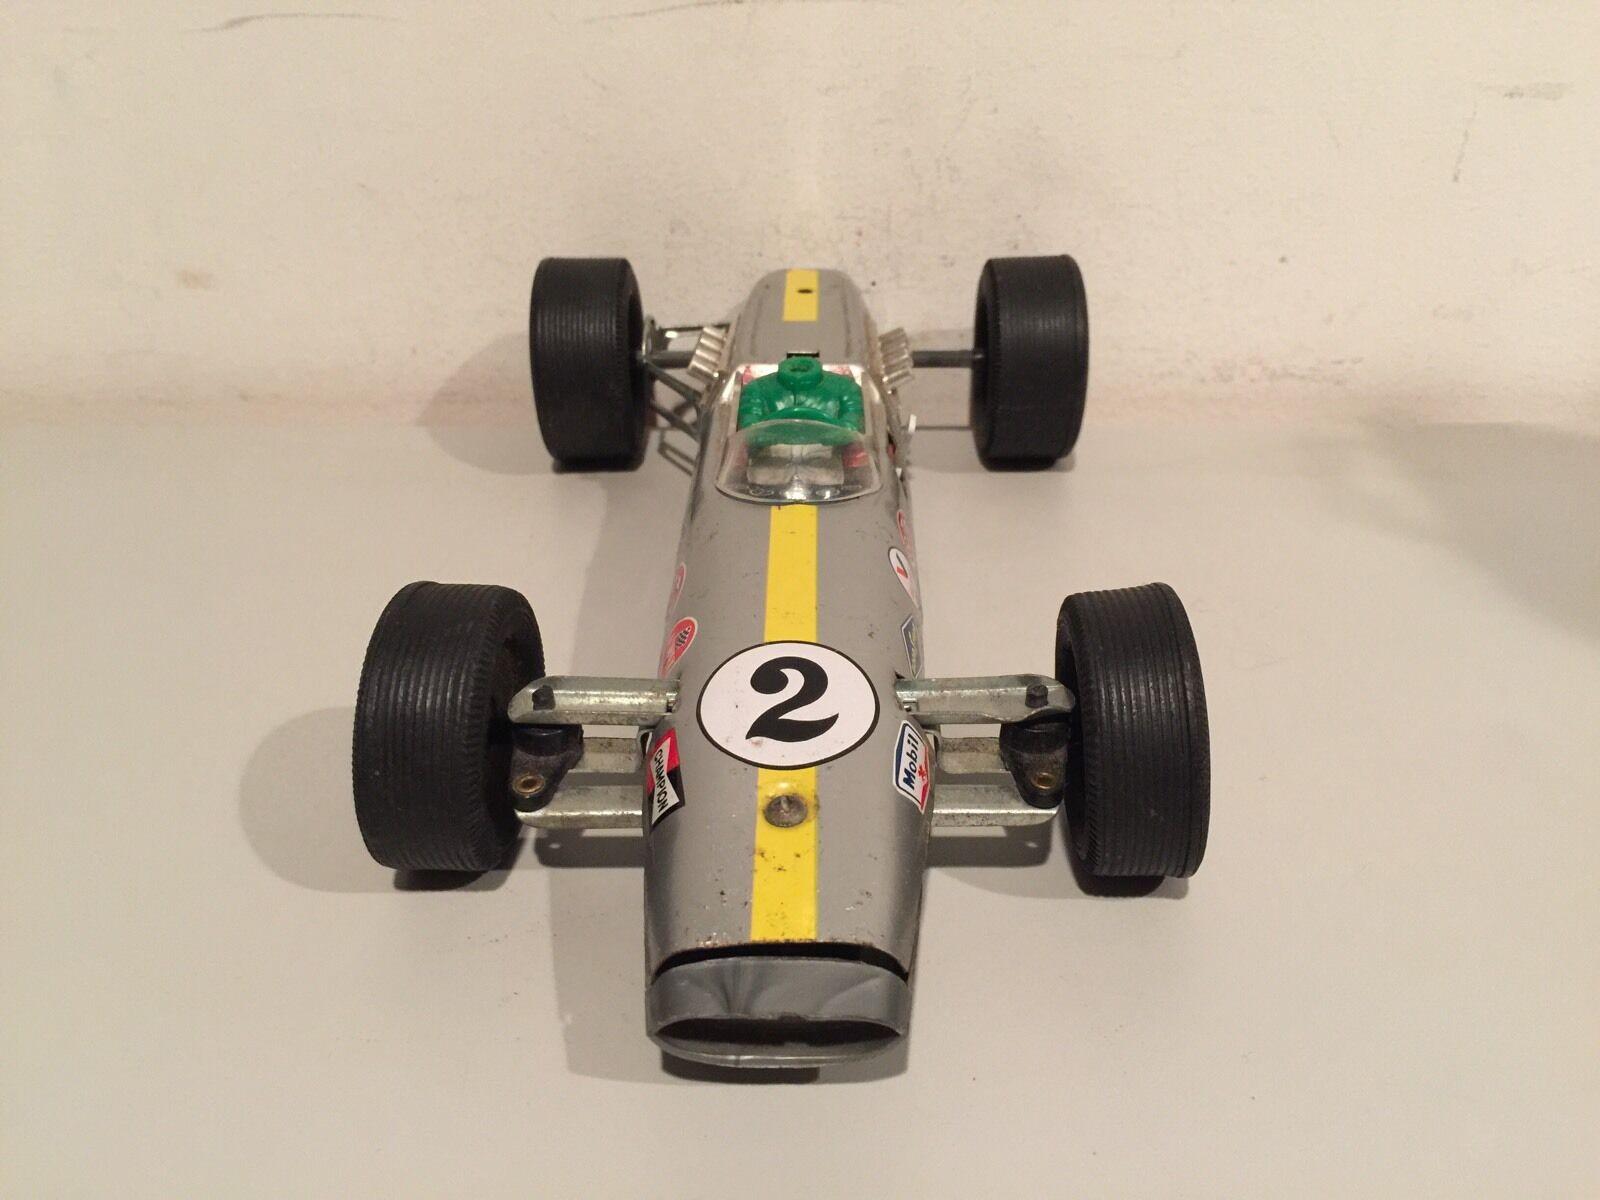 VINTAGE DAIYA LOTUS FORMULA 2 2 2 RACE CAR MADE IN JAPAN TIN AND PLASTIC VERY RARE  f57